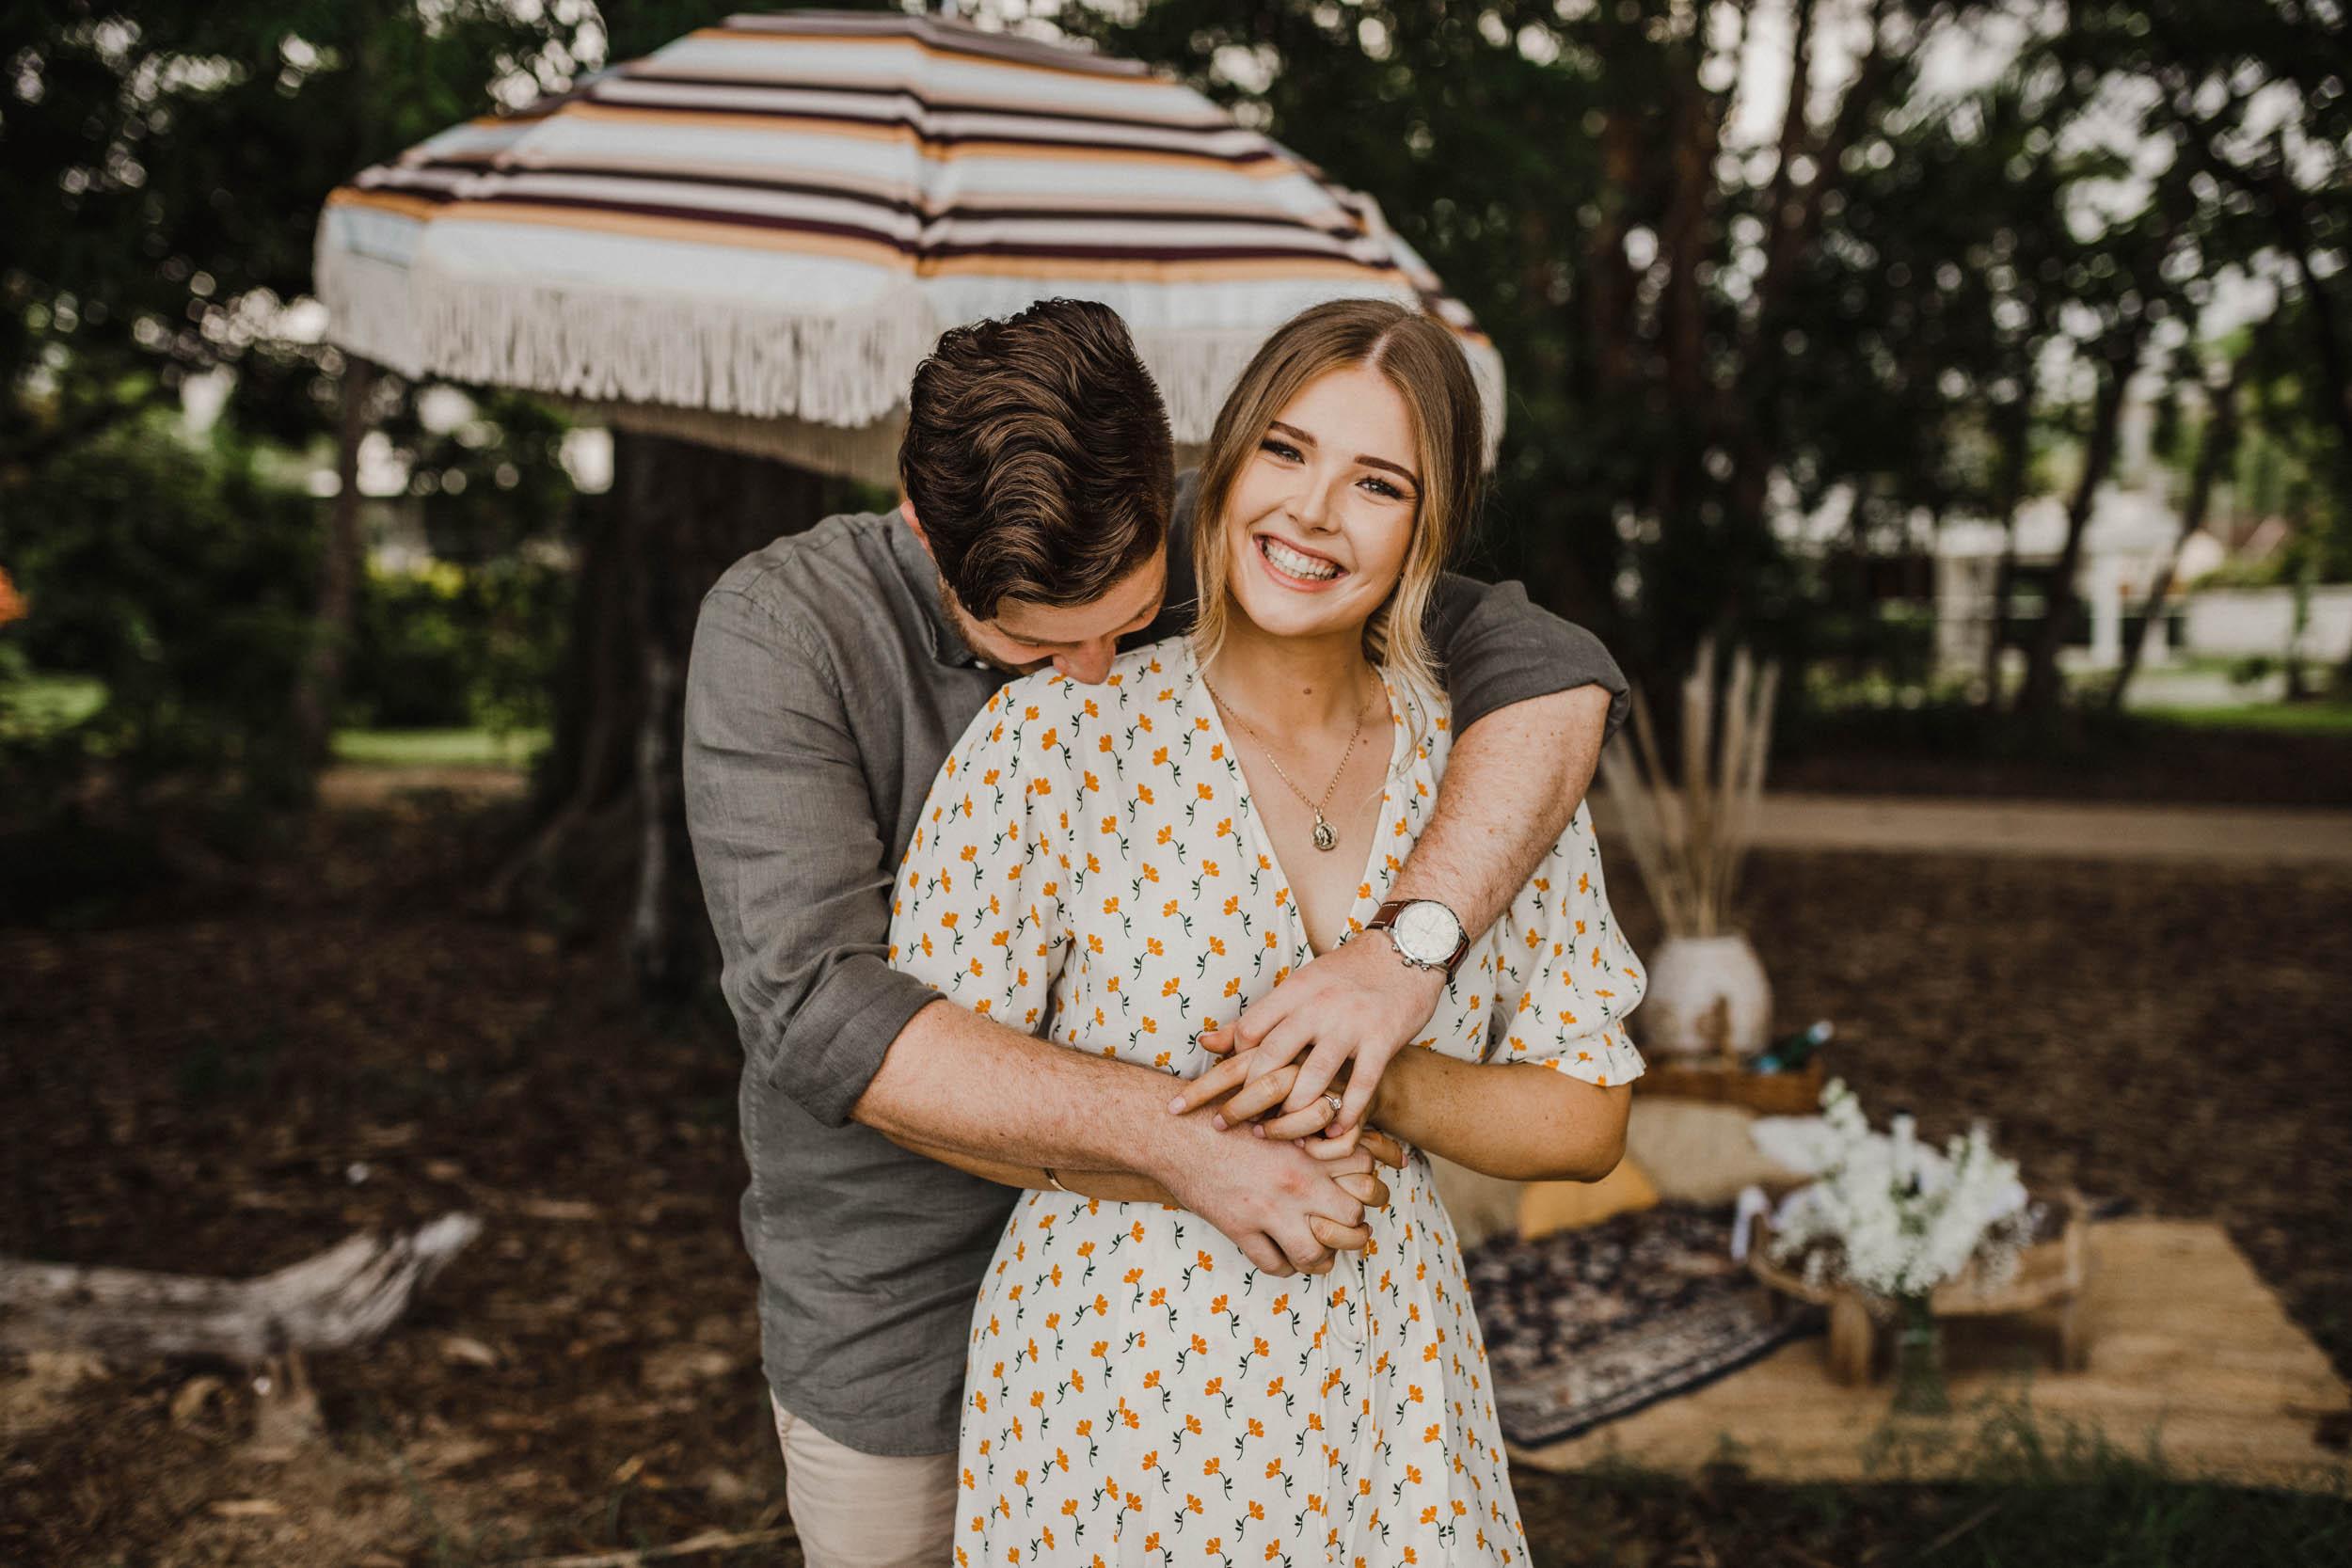 The Raw Photographer - Cairns Wedding Photographer - Beach Engagement Shoot - Candid Picnic-15.jpg